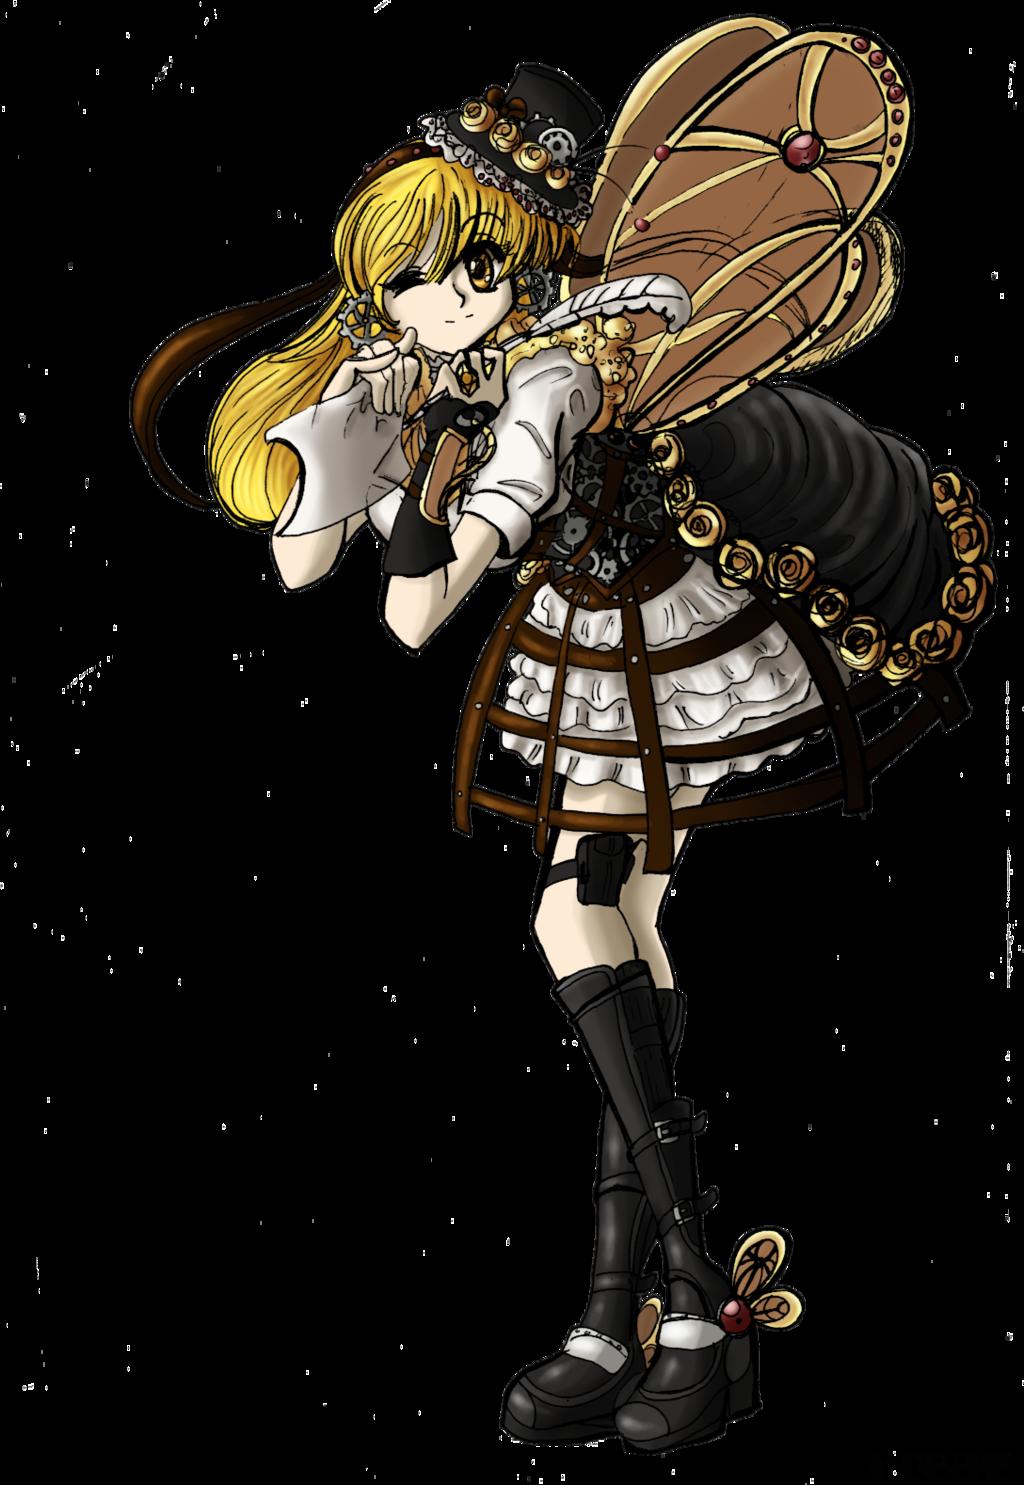 Steampunk Girl by OmniLRenegadE on DeviantArt RAMDOM